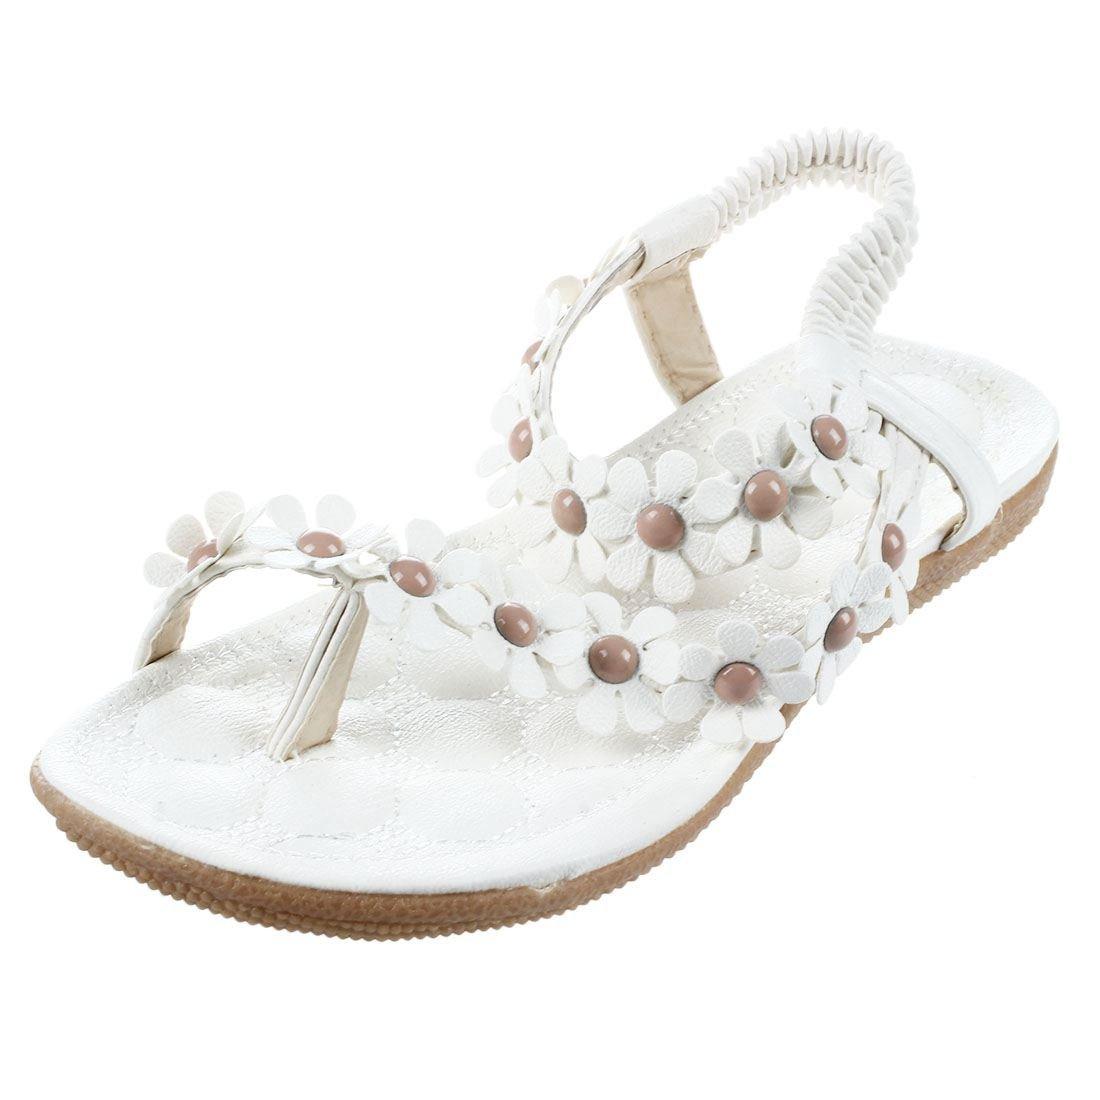 SODIAL(R) New Flip-flop sandals open toe flip women's shoes flat flats bohemia flower beaded soft outsole sweet for women 669 white US6=EUR36=feet length 23CM